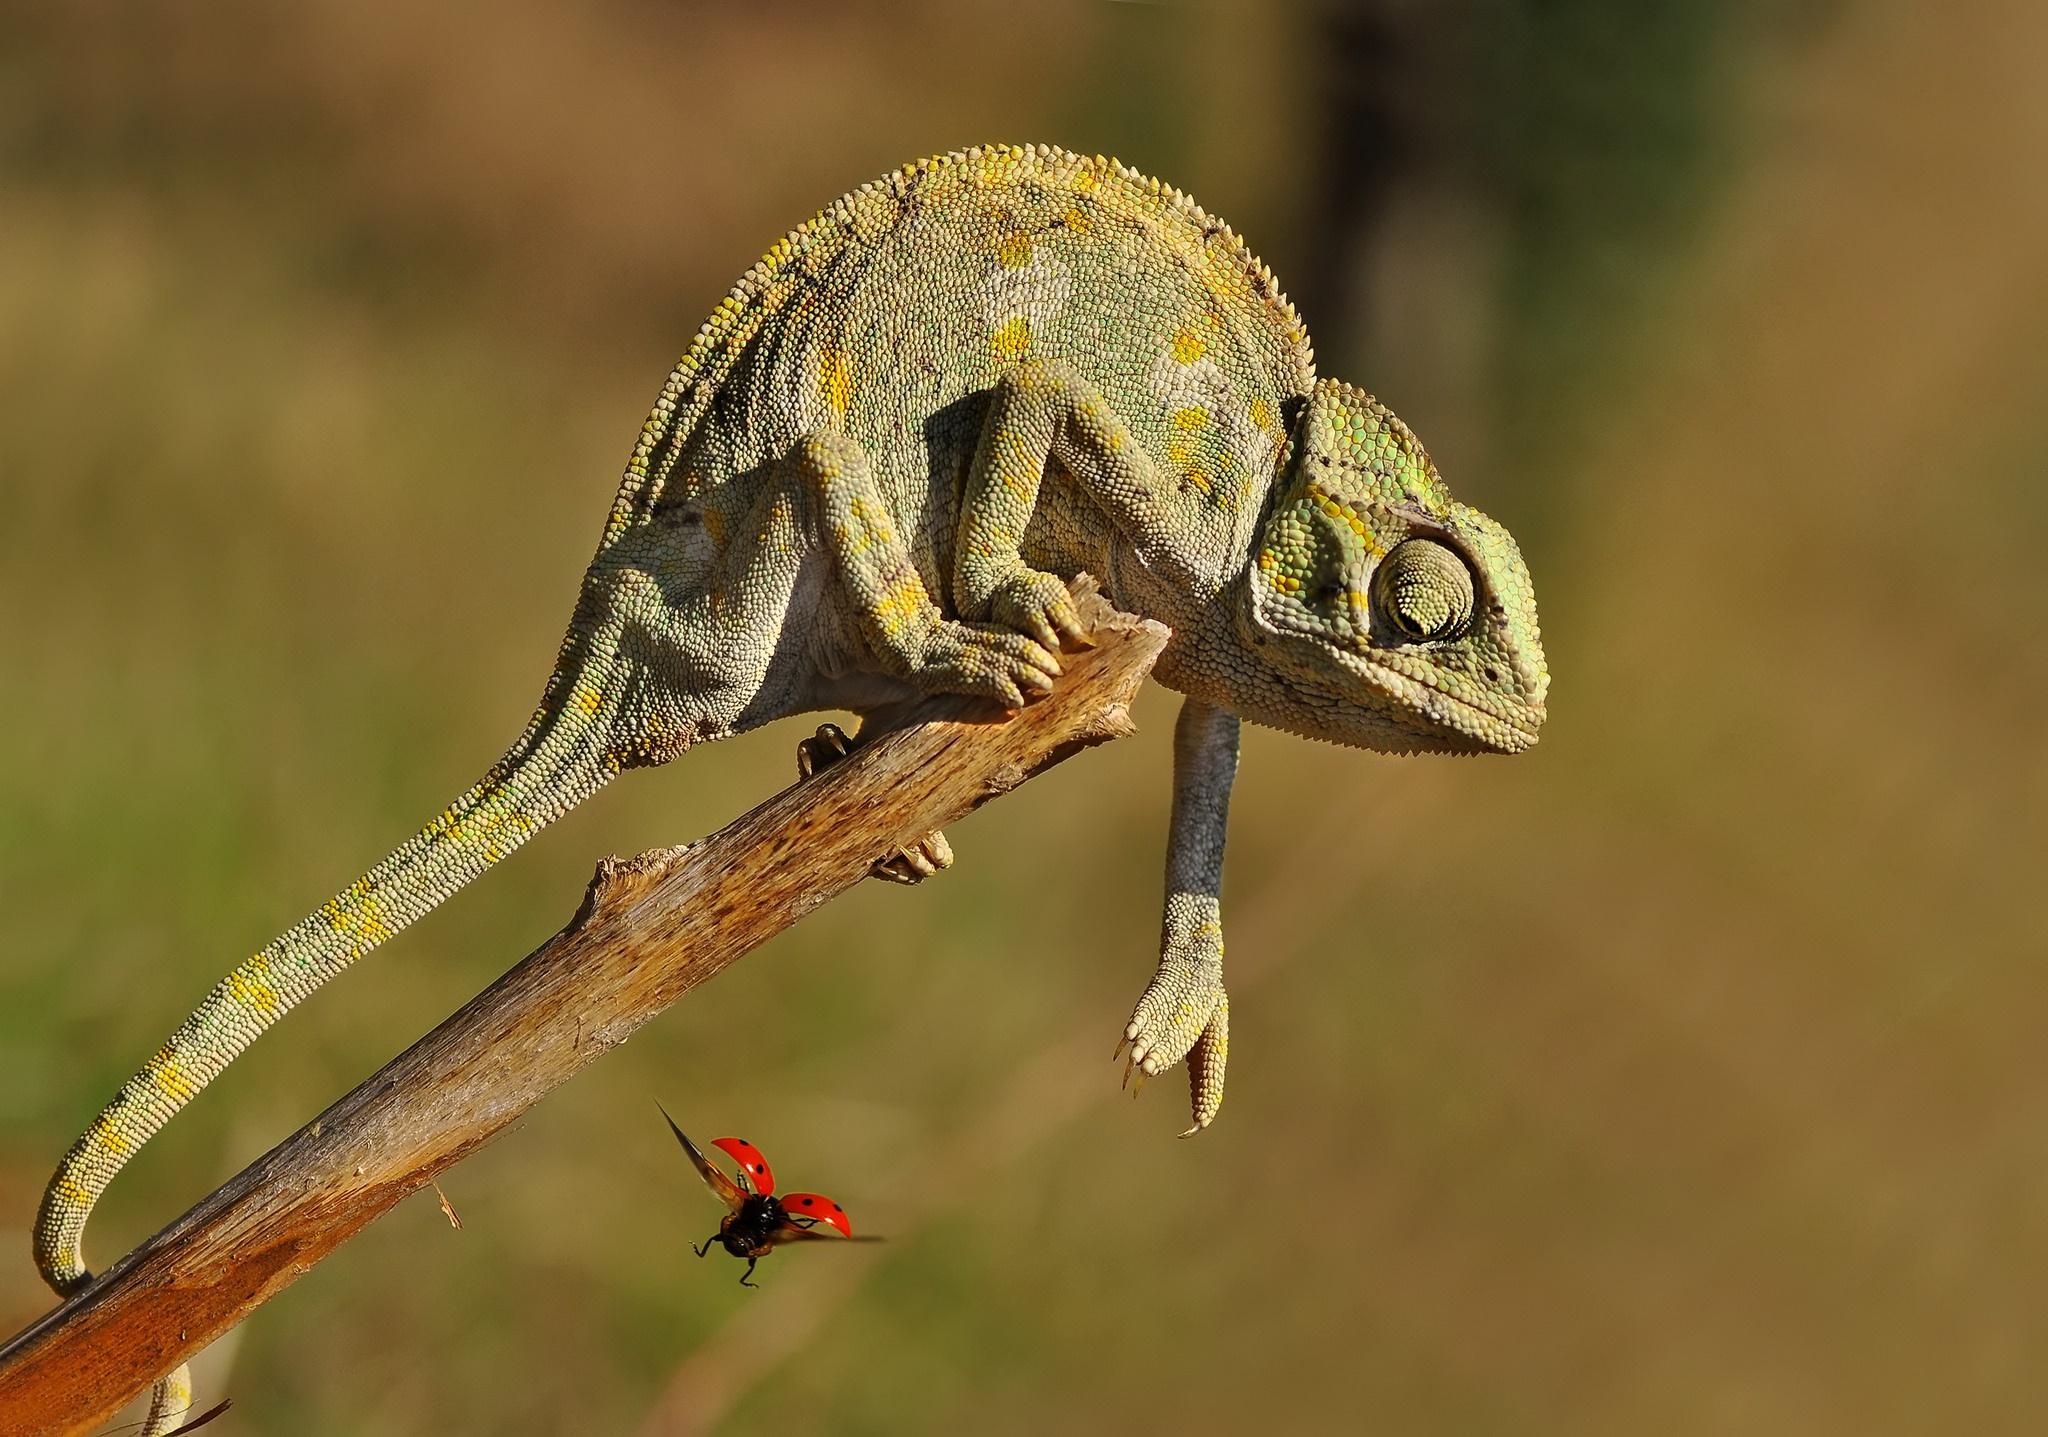 Animal Chameleon Ladybug Lizard Reptile Wildlife 2048x1437